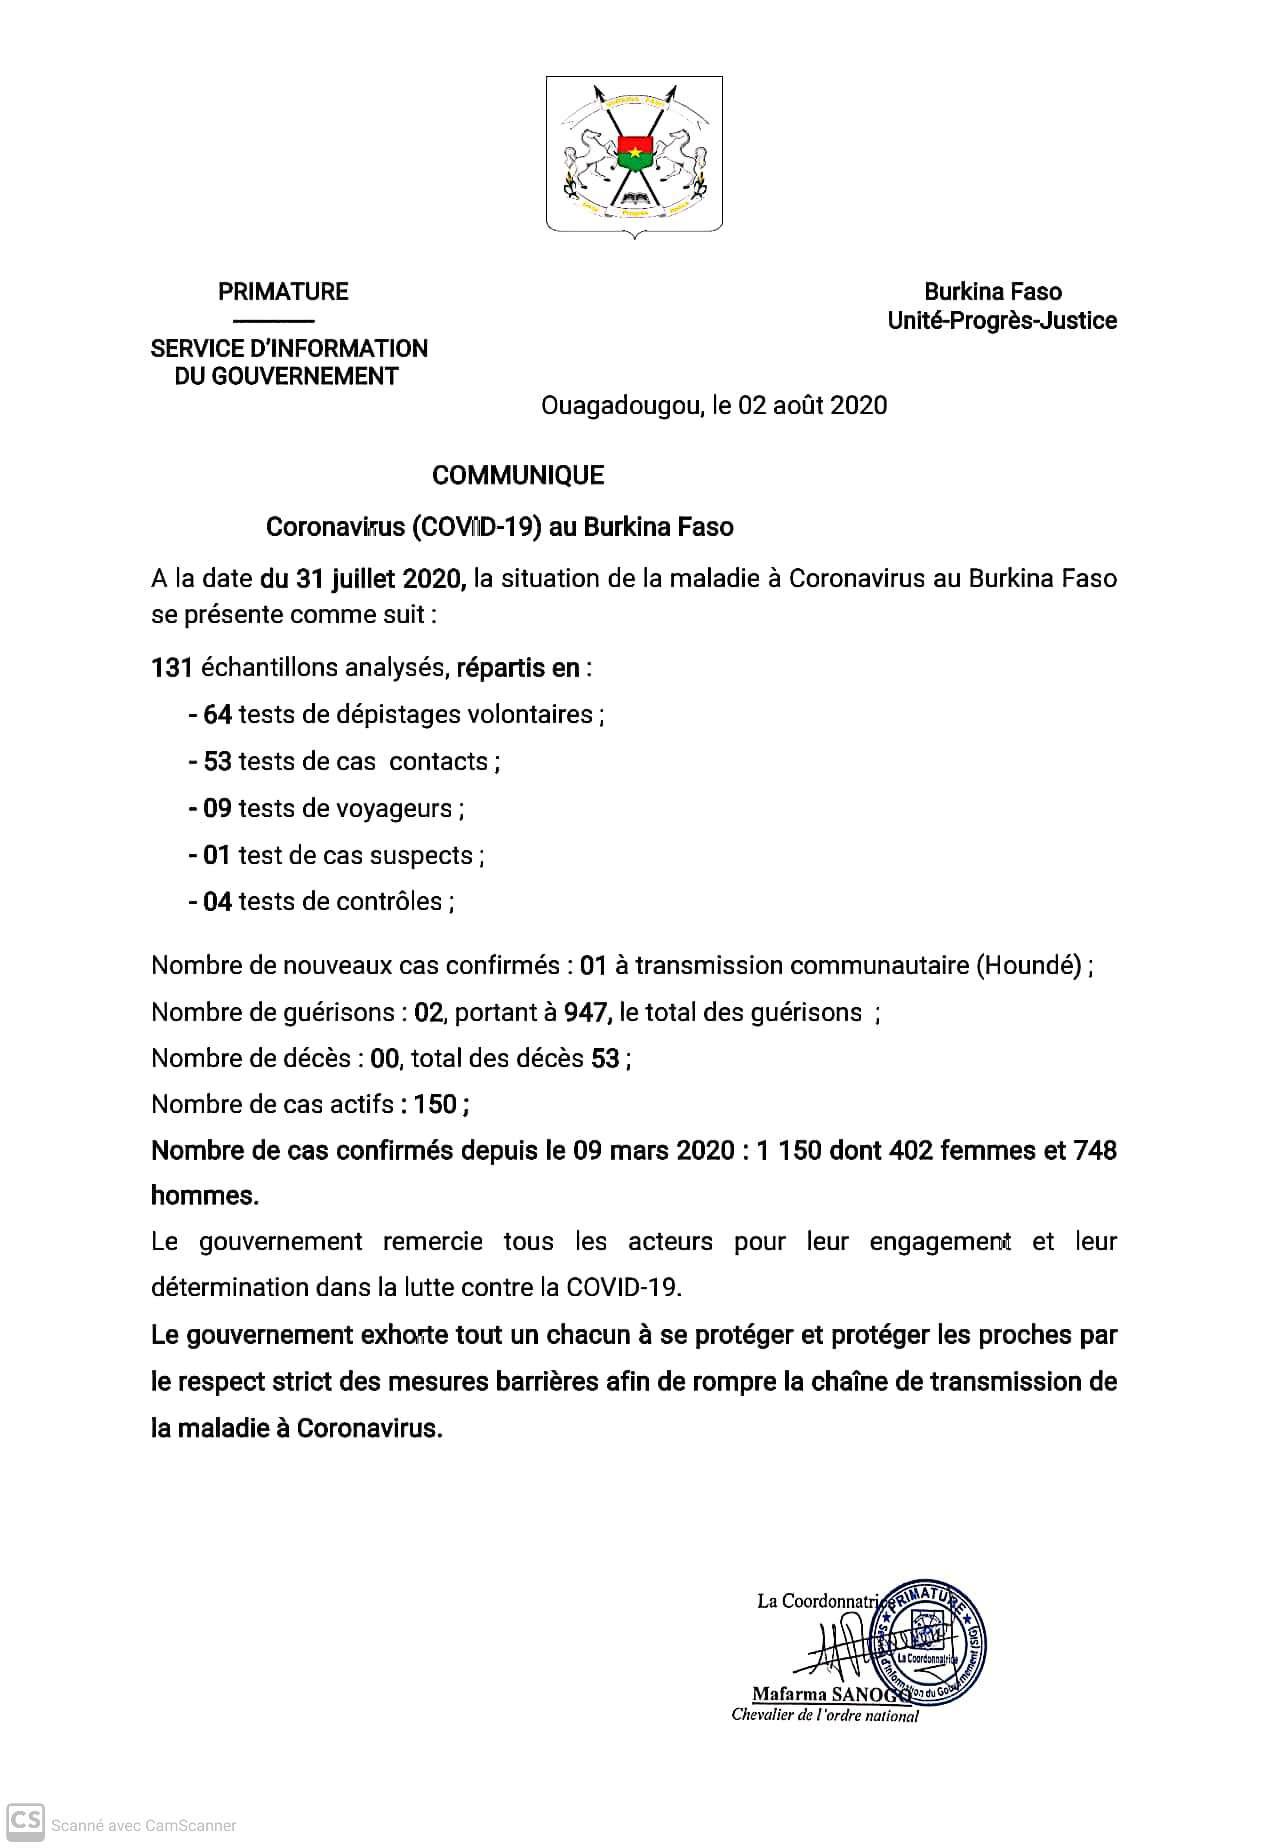 https://www.sig.gov.bf/fileadmin/user_upload/Communique___point__Covid-19_Burkina_Faso_31_juillet_2020_01.jpg